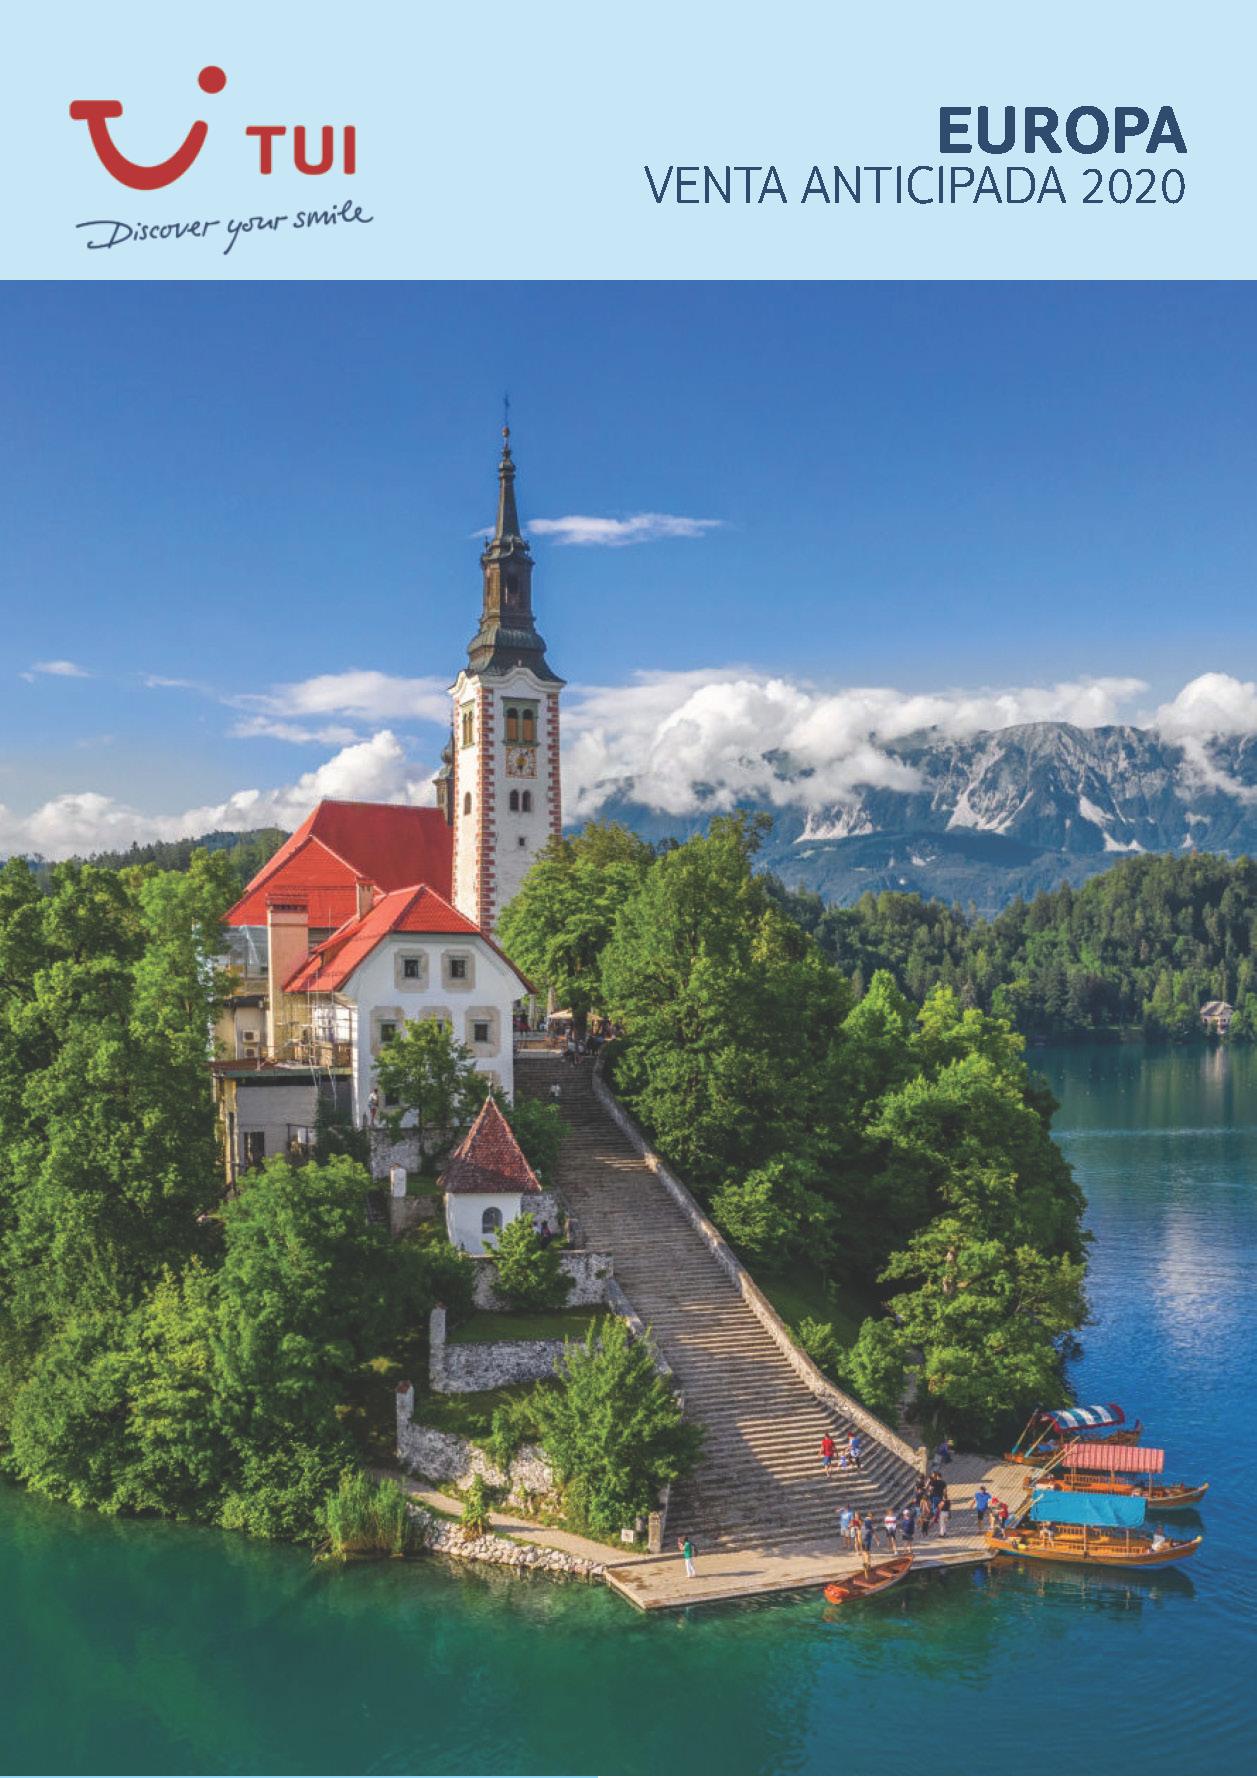 Catalogo TUI Ambassador Tours Venta Anticipada Europa 2020